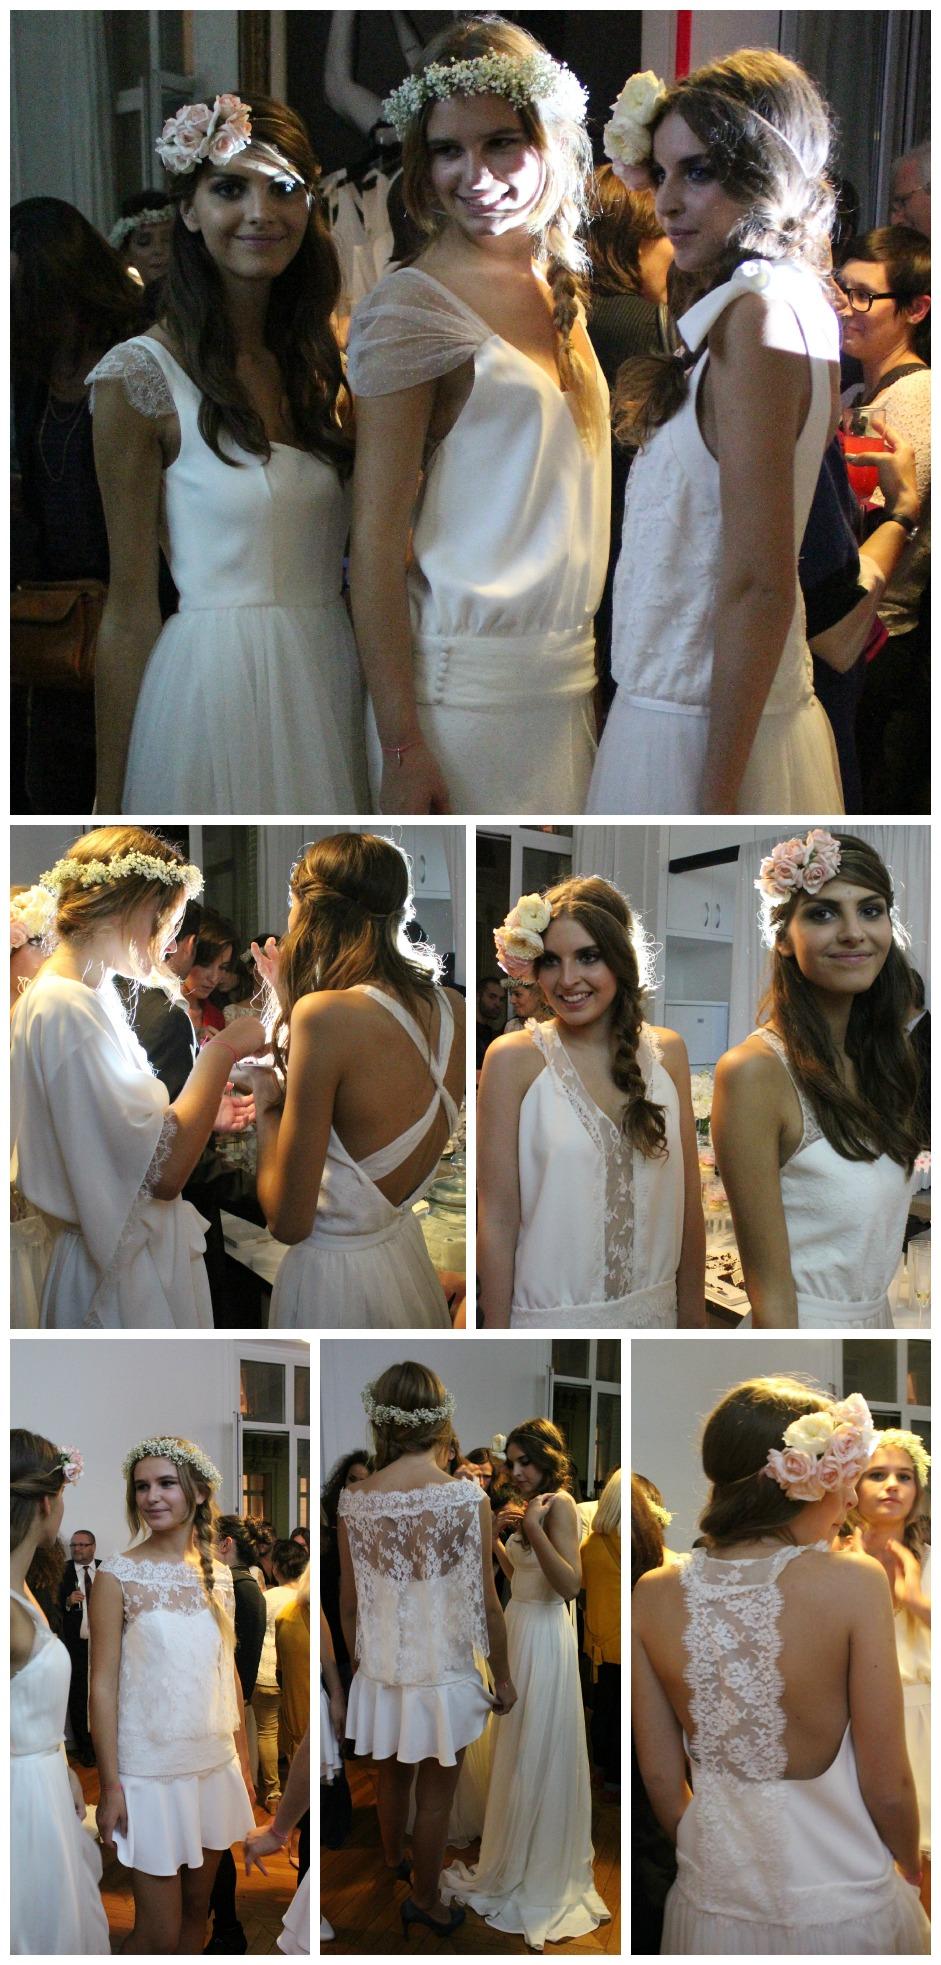 Venues de mariage charleston sc peinture for Magasins de robe de mariage charleston sc